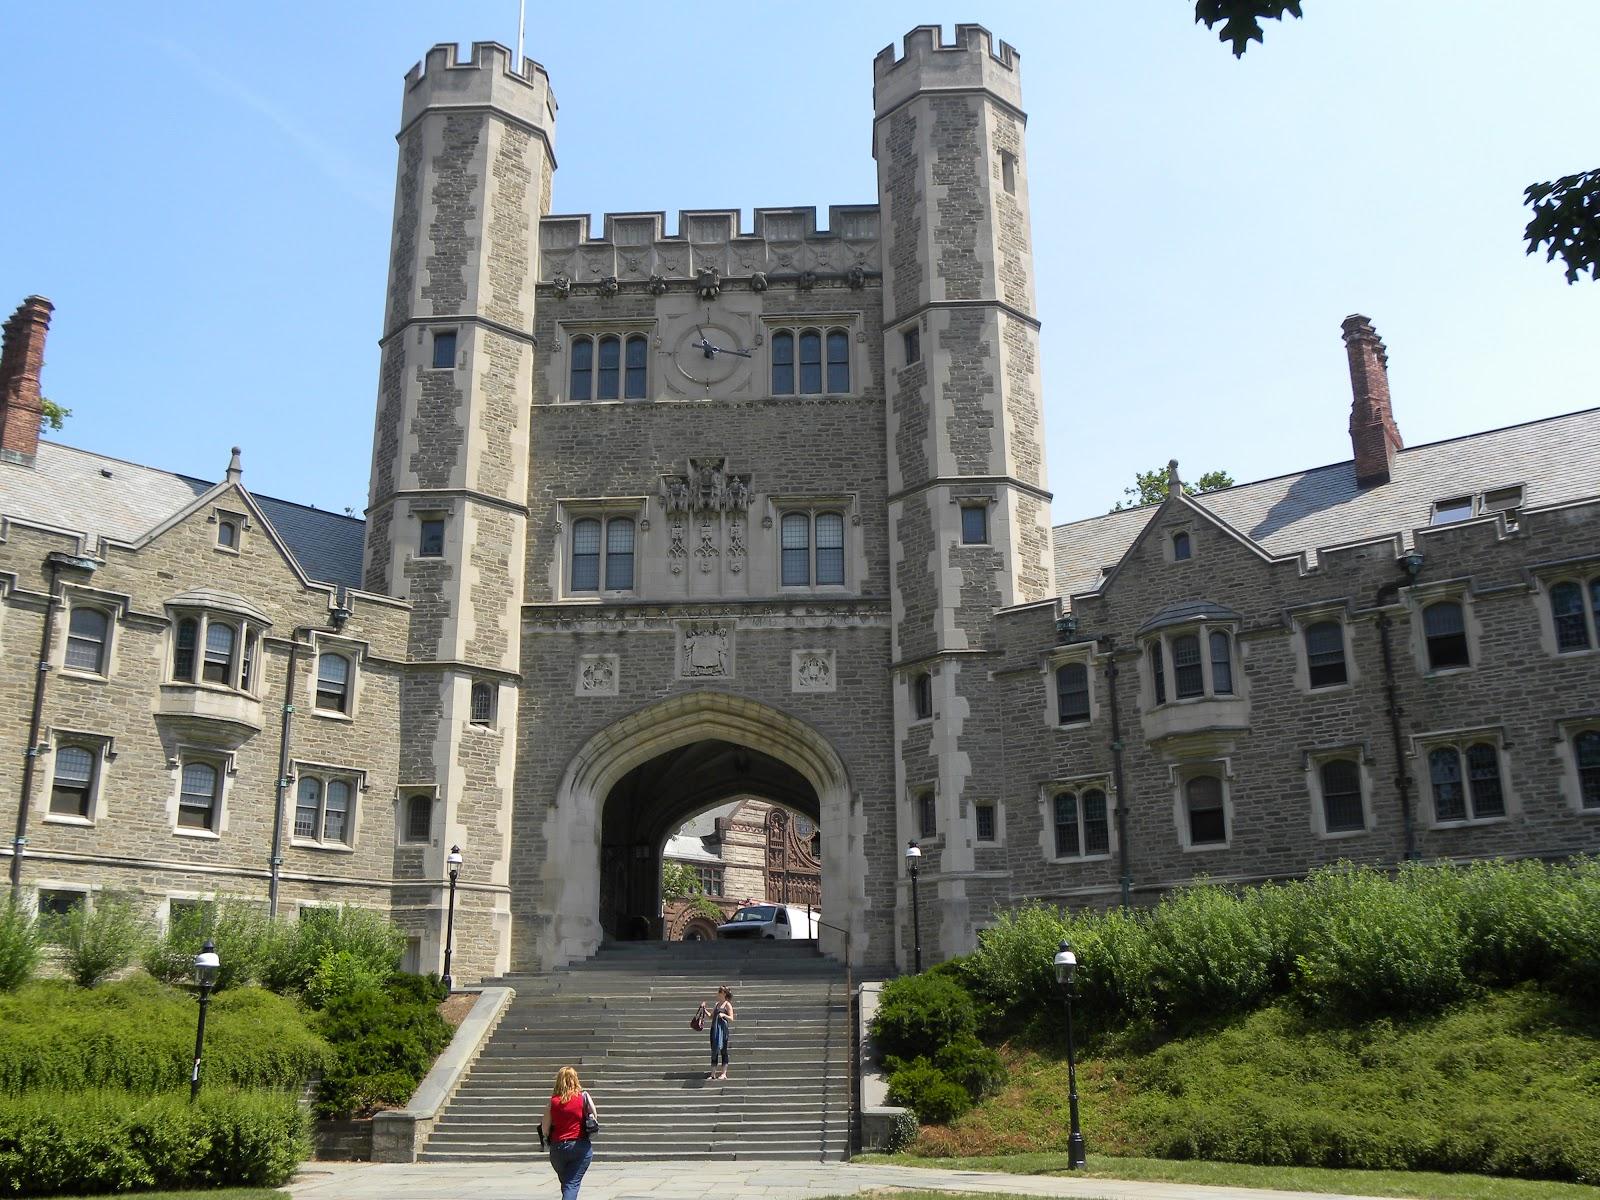 http://1.bp.blogspot.com/-Tn6nVon4_eg/TfA1Pm3bhMI/AAAAAAAAAS8/kaNMpBK4kik/s1600/Campus+Princeton+y+Trenton.+8.6.2011+009.jpg